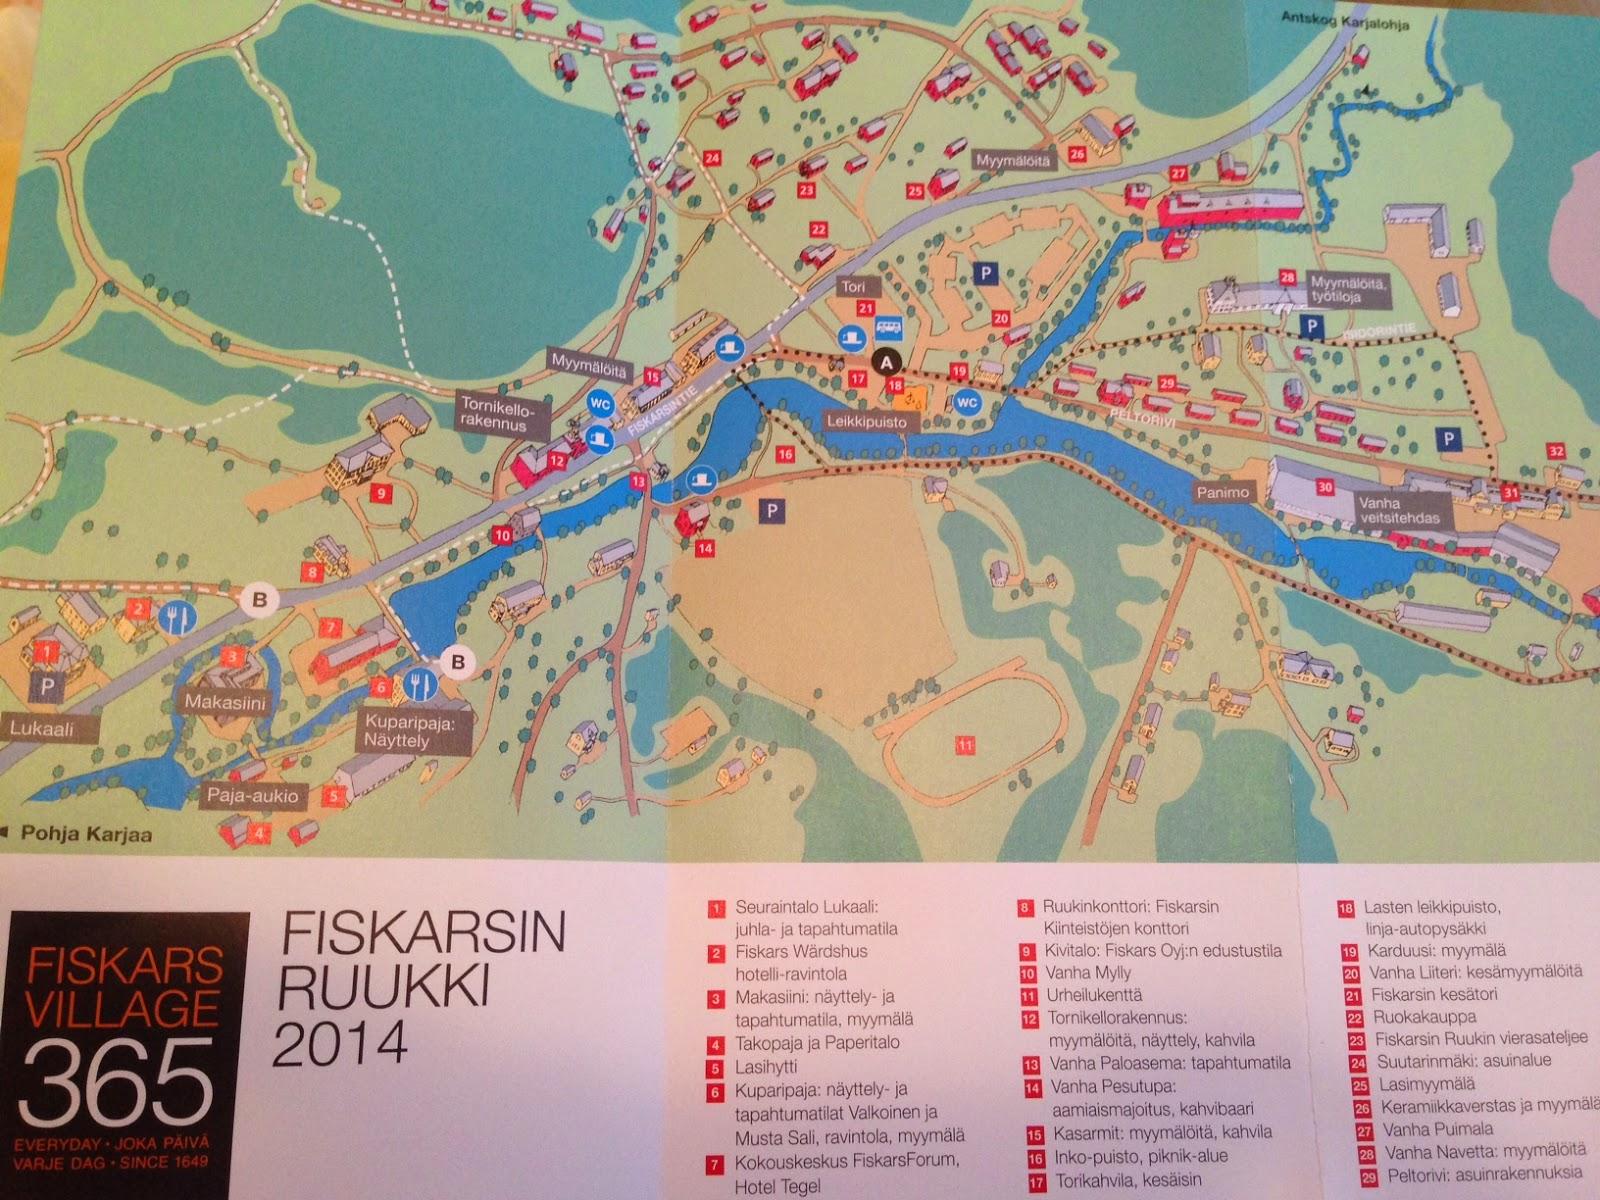 My Life As A Bum Fiskars Village Summer 2014 Exhibition Blurred Lines